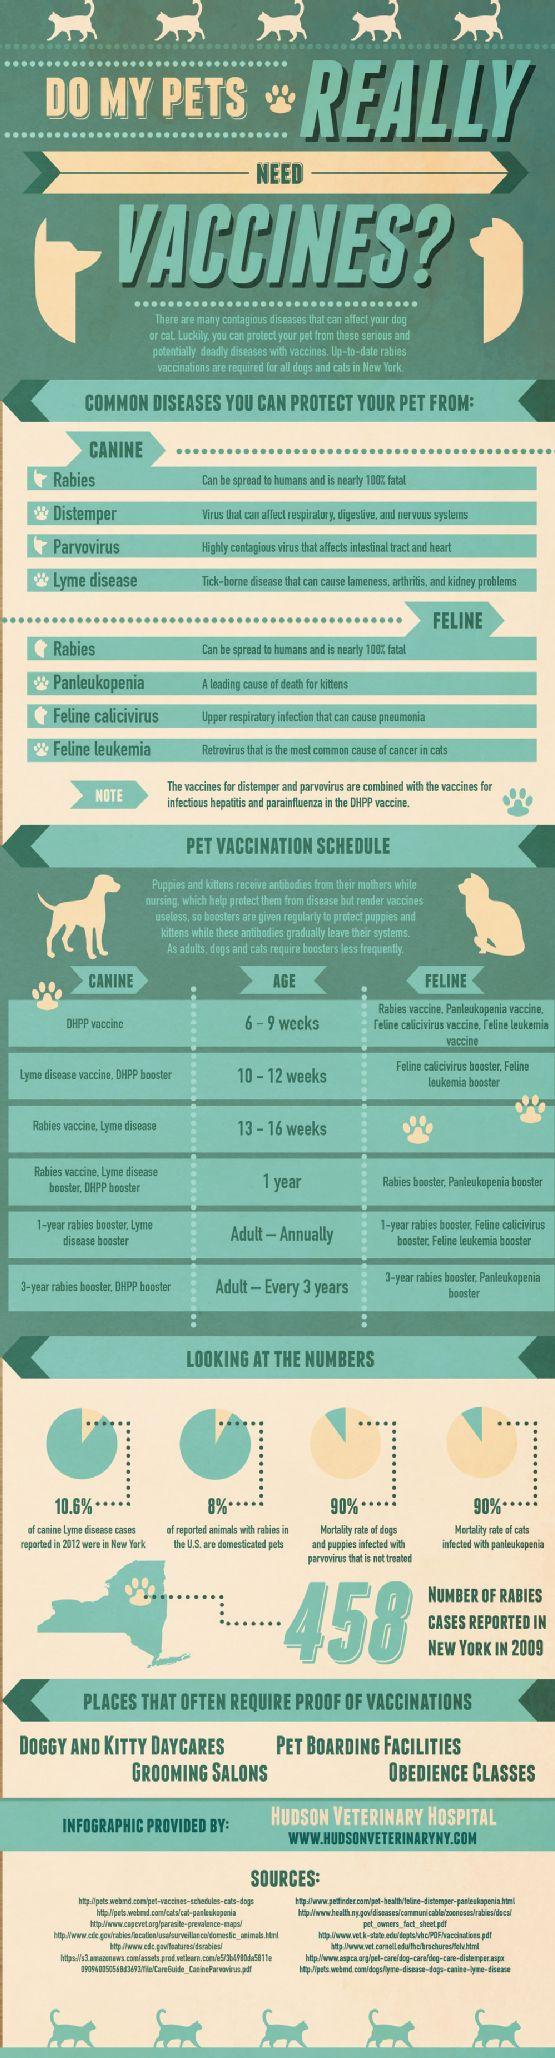 do-my-pets-really-need-vaccines_50bfdbcb3a08c